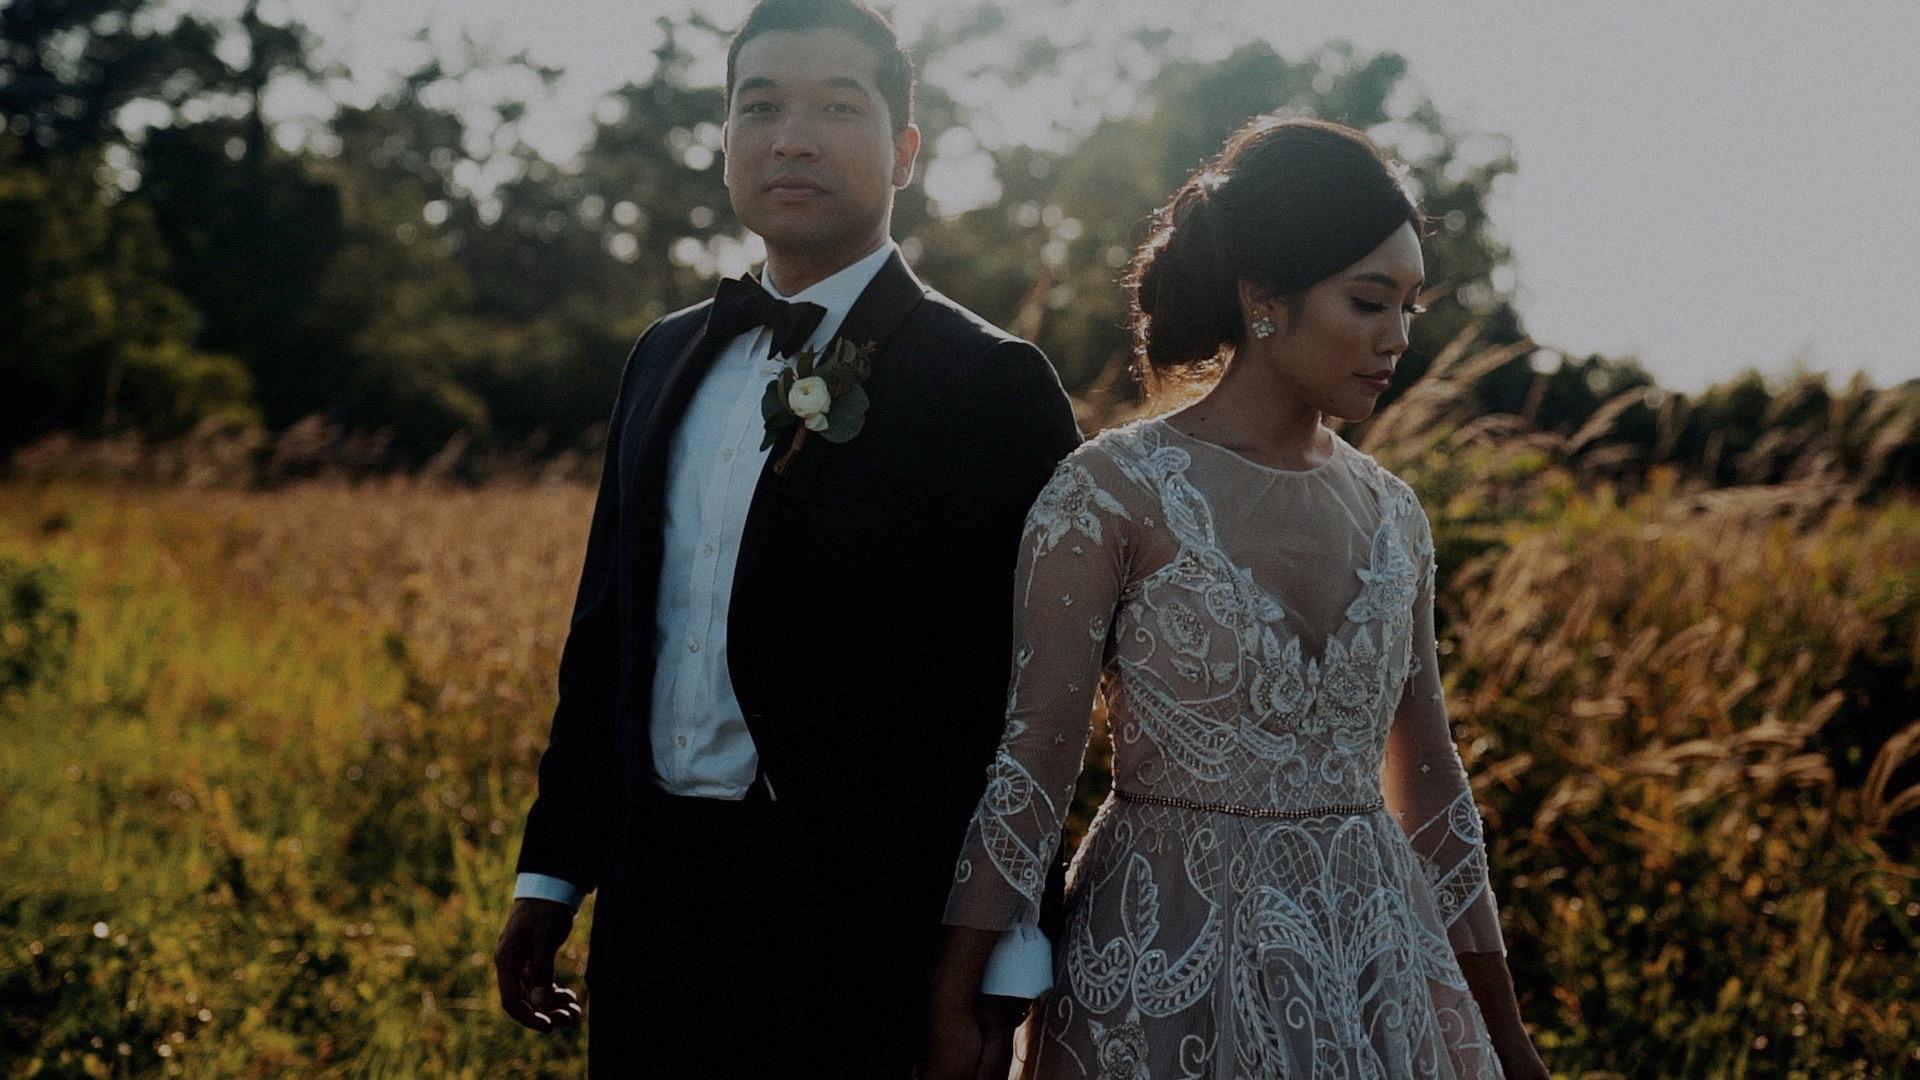 Theresa + Steven | Houston, Texas | Balmorhea Wedding and Events